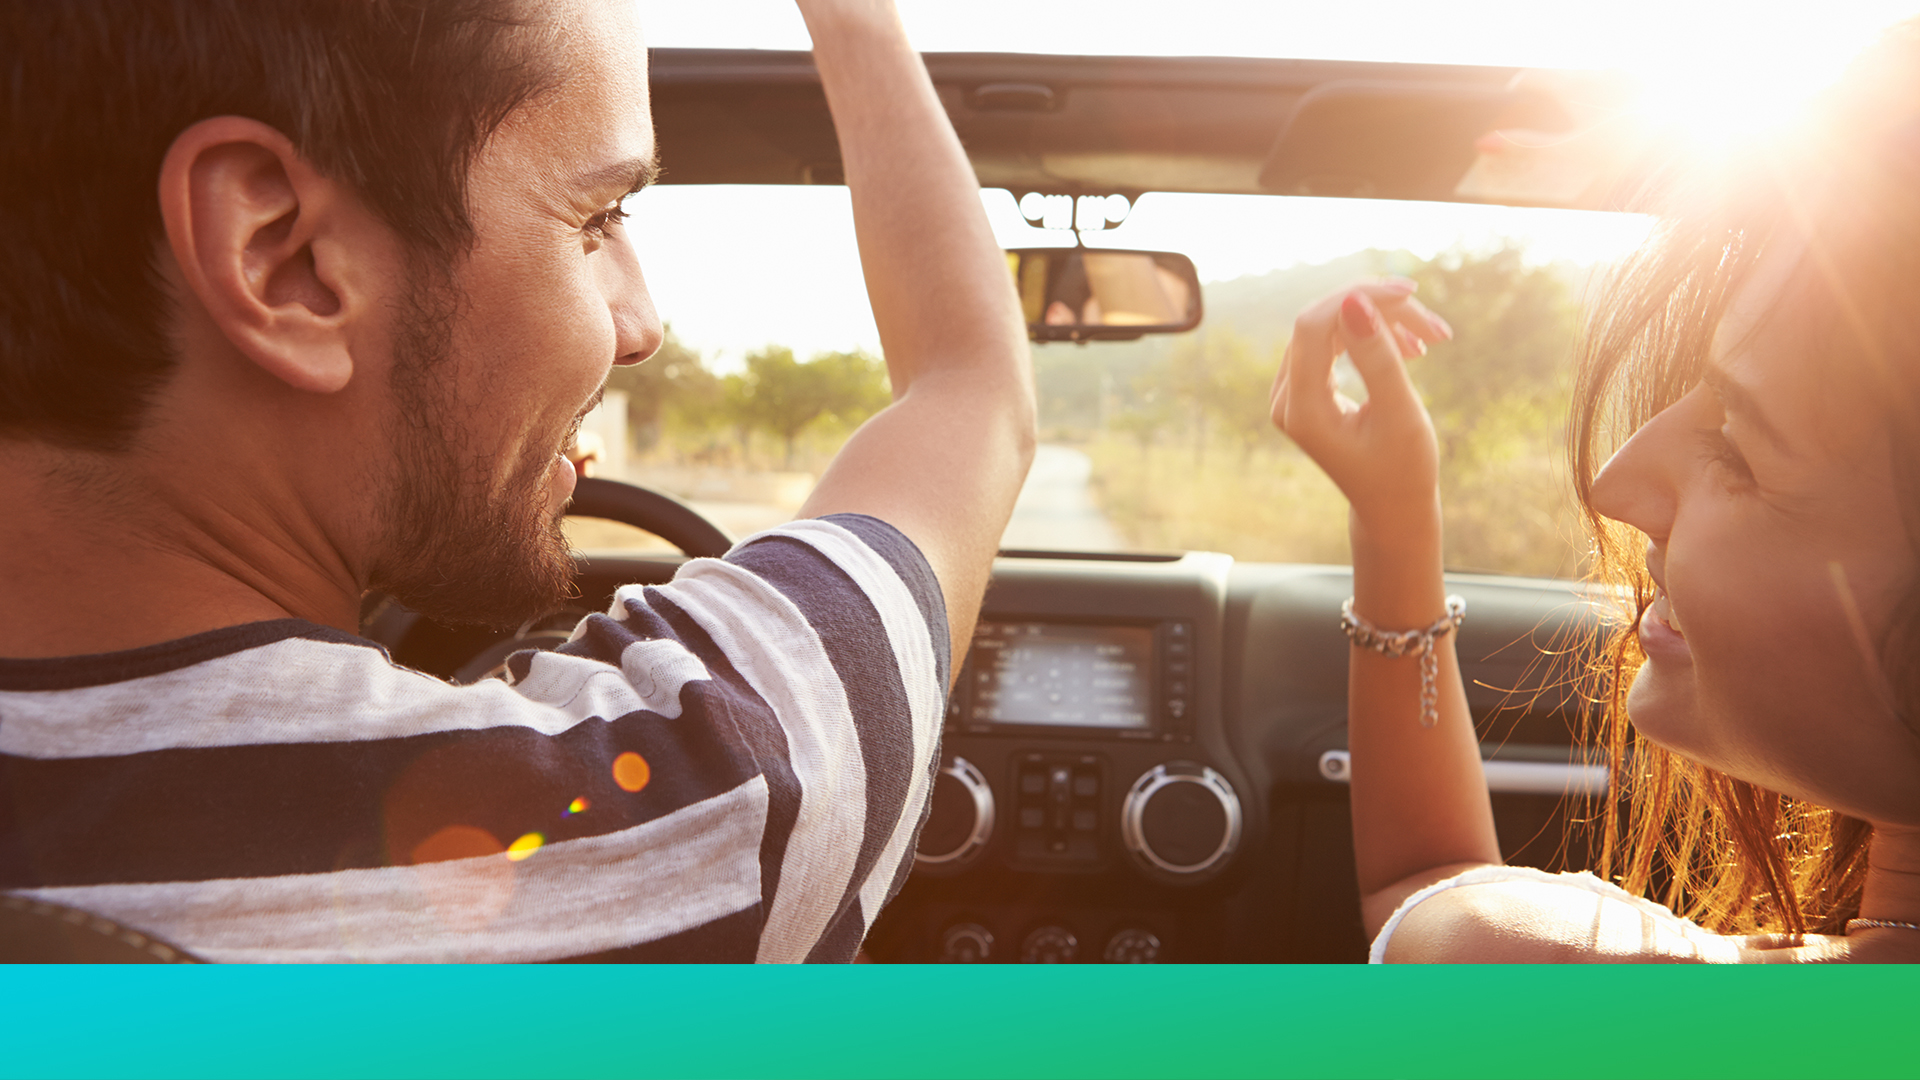 The Best Sites for Car Shopping | GOBankingRates